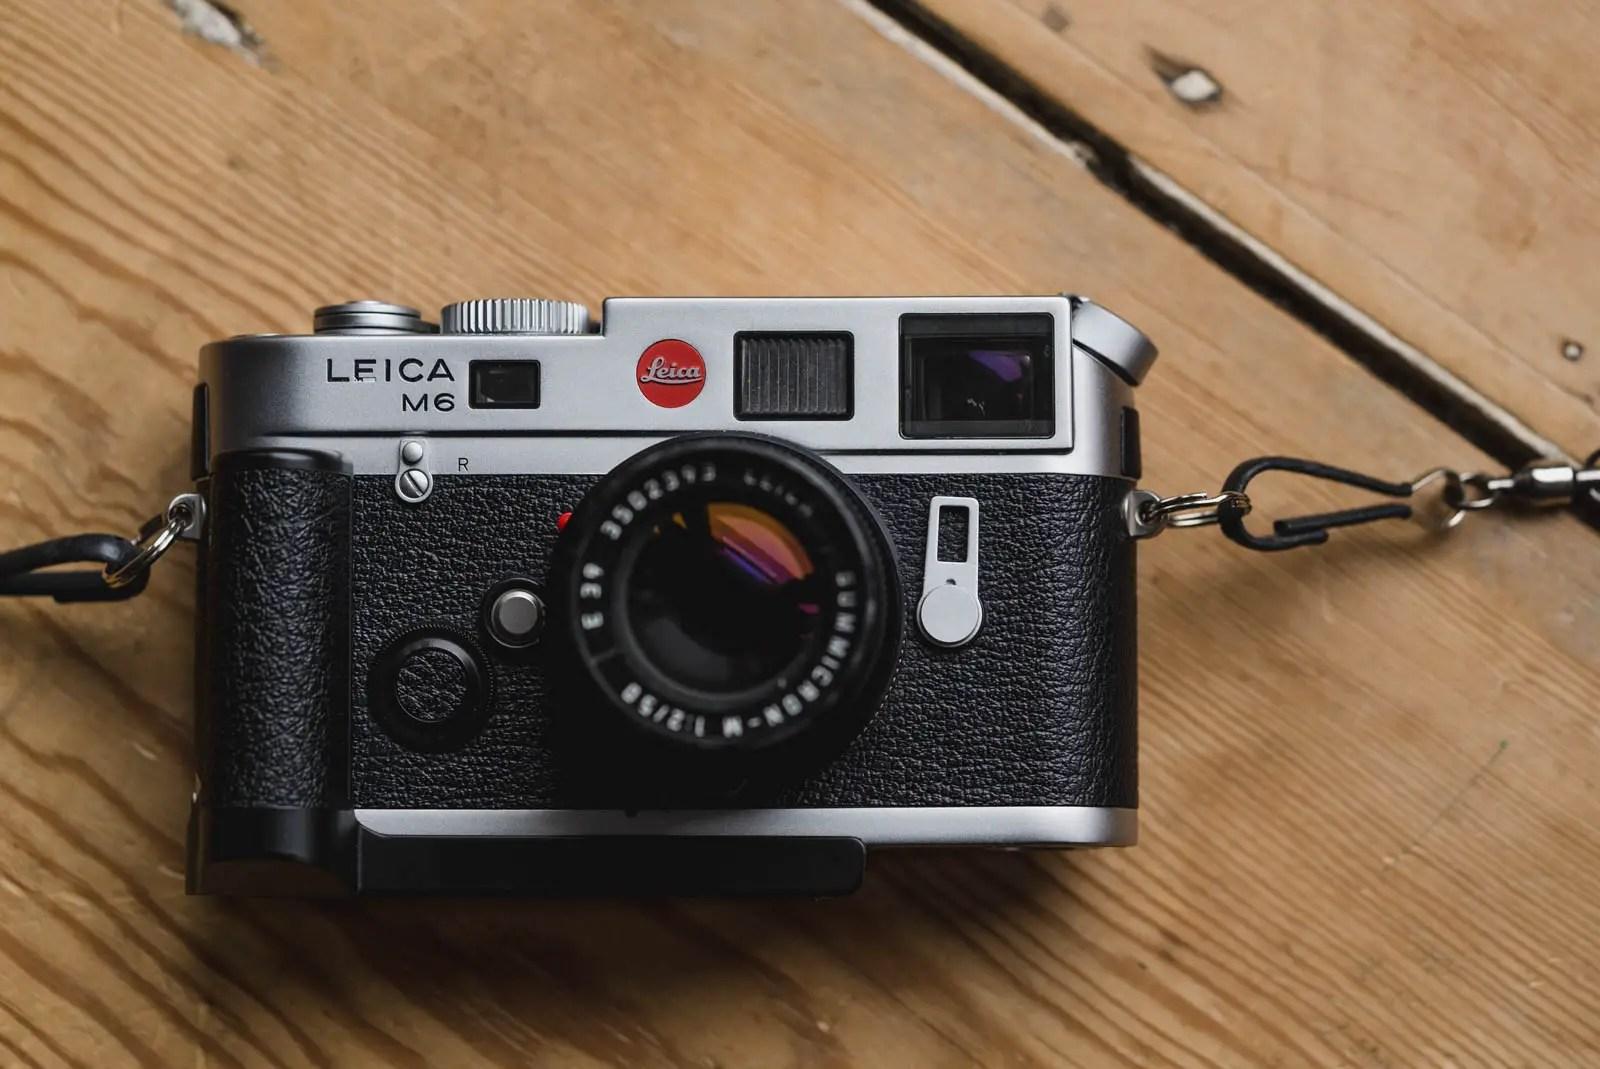 The Leica M6 Classic & Leica M6 TTL - 35mmc